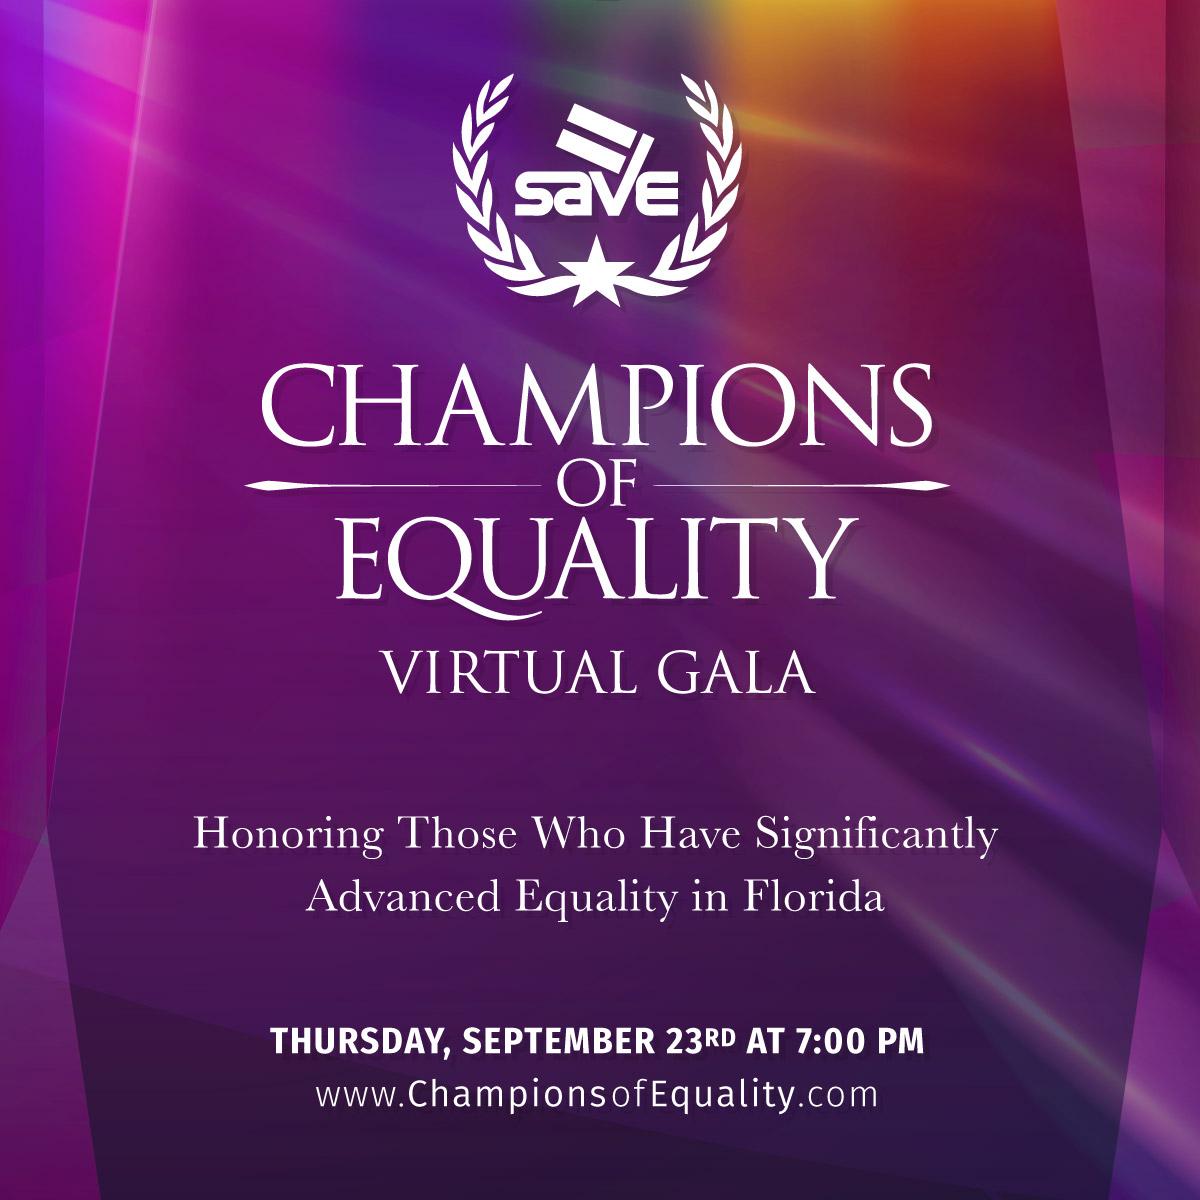 Champions of Equality Virtual Gala